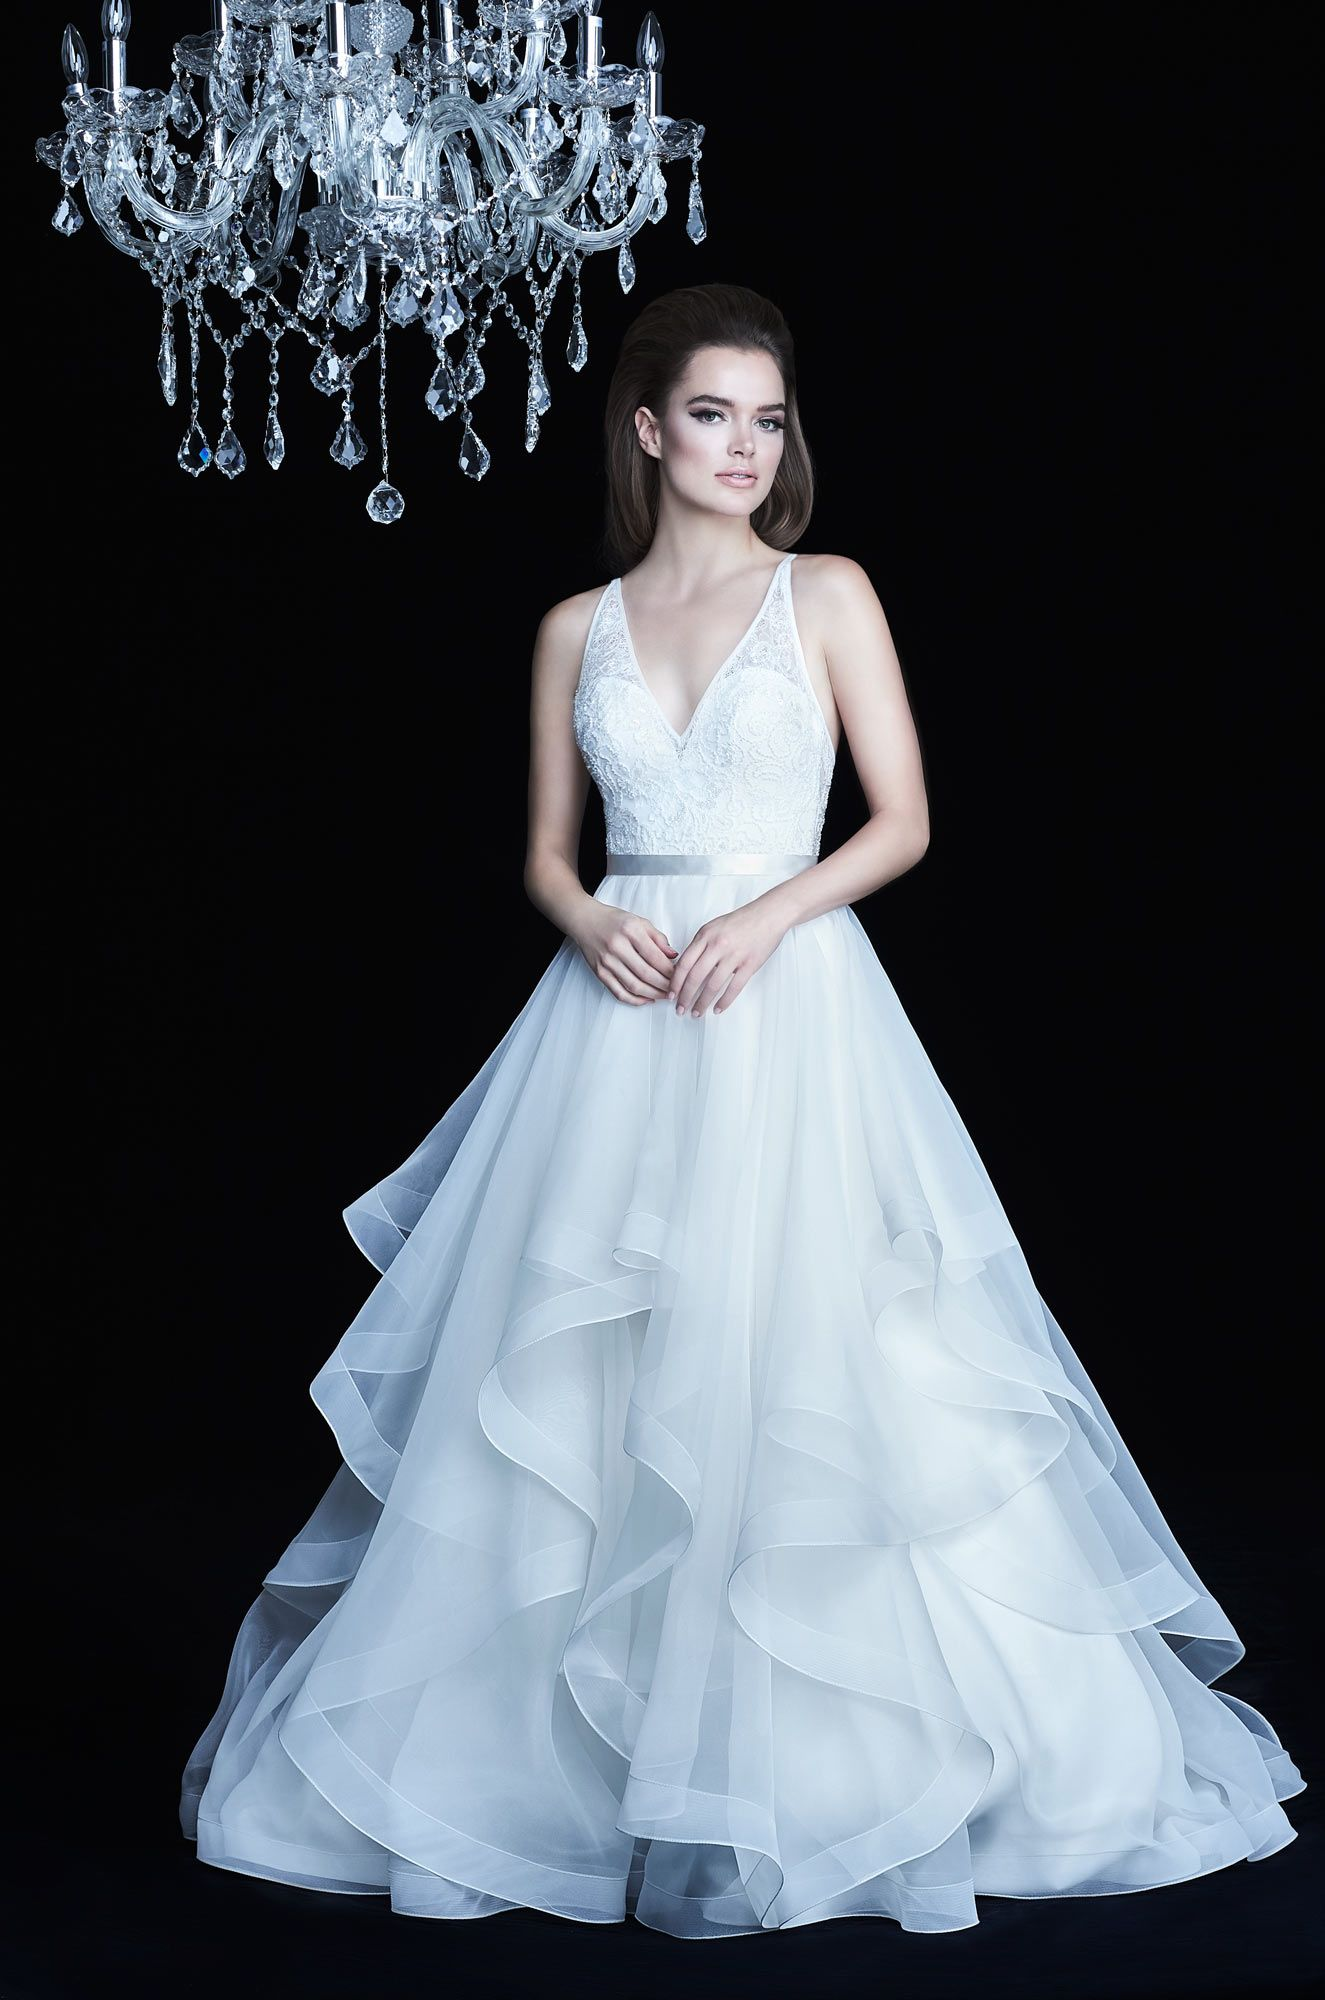 Low vneck wedding dress style wedding pinterest